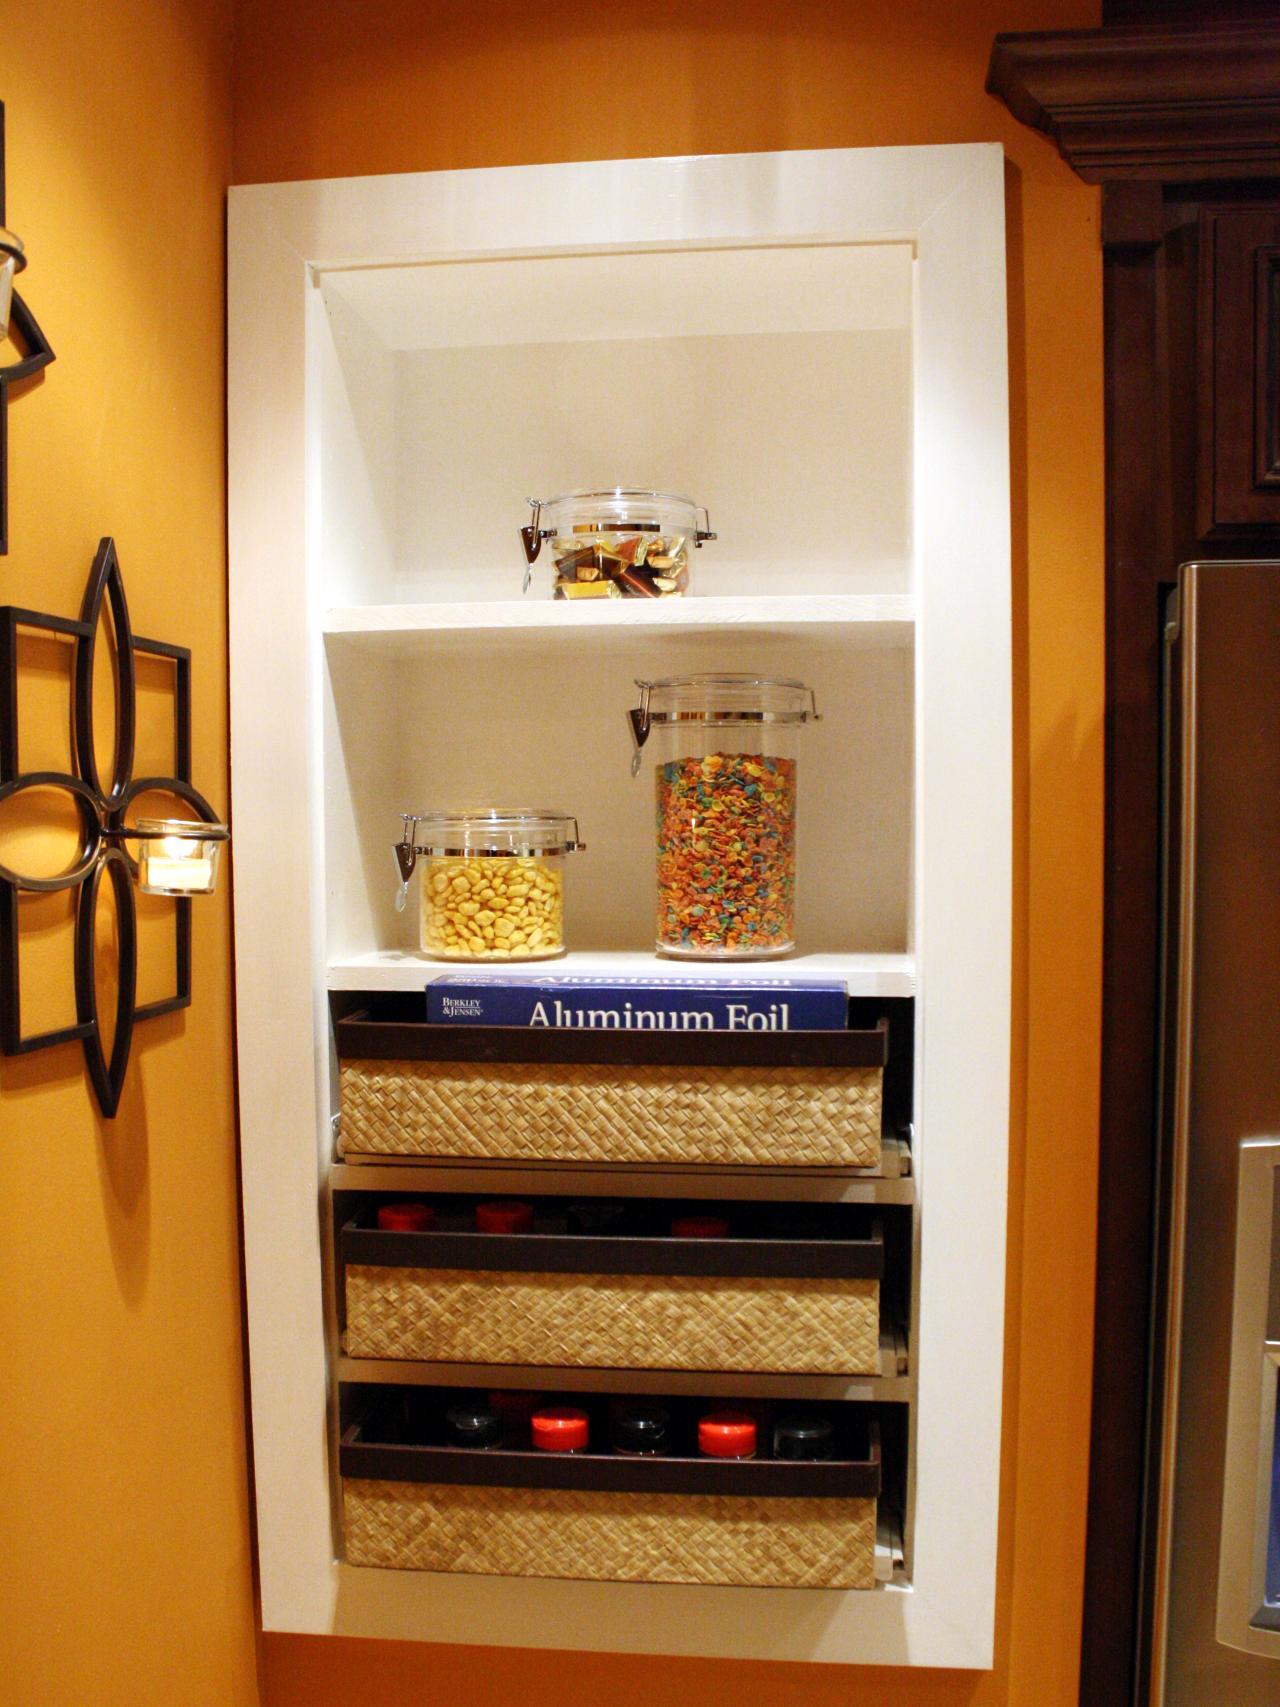 Dkim405 Kitchen Shelving Unit Beauty S3x4